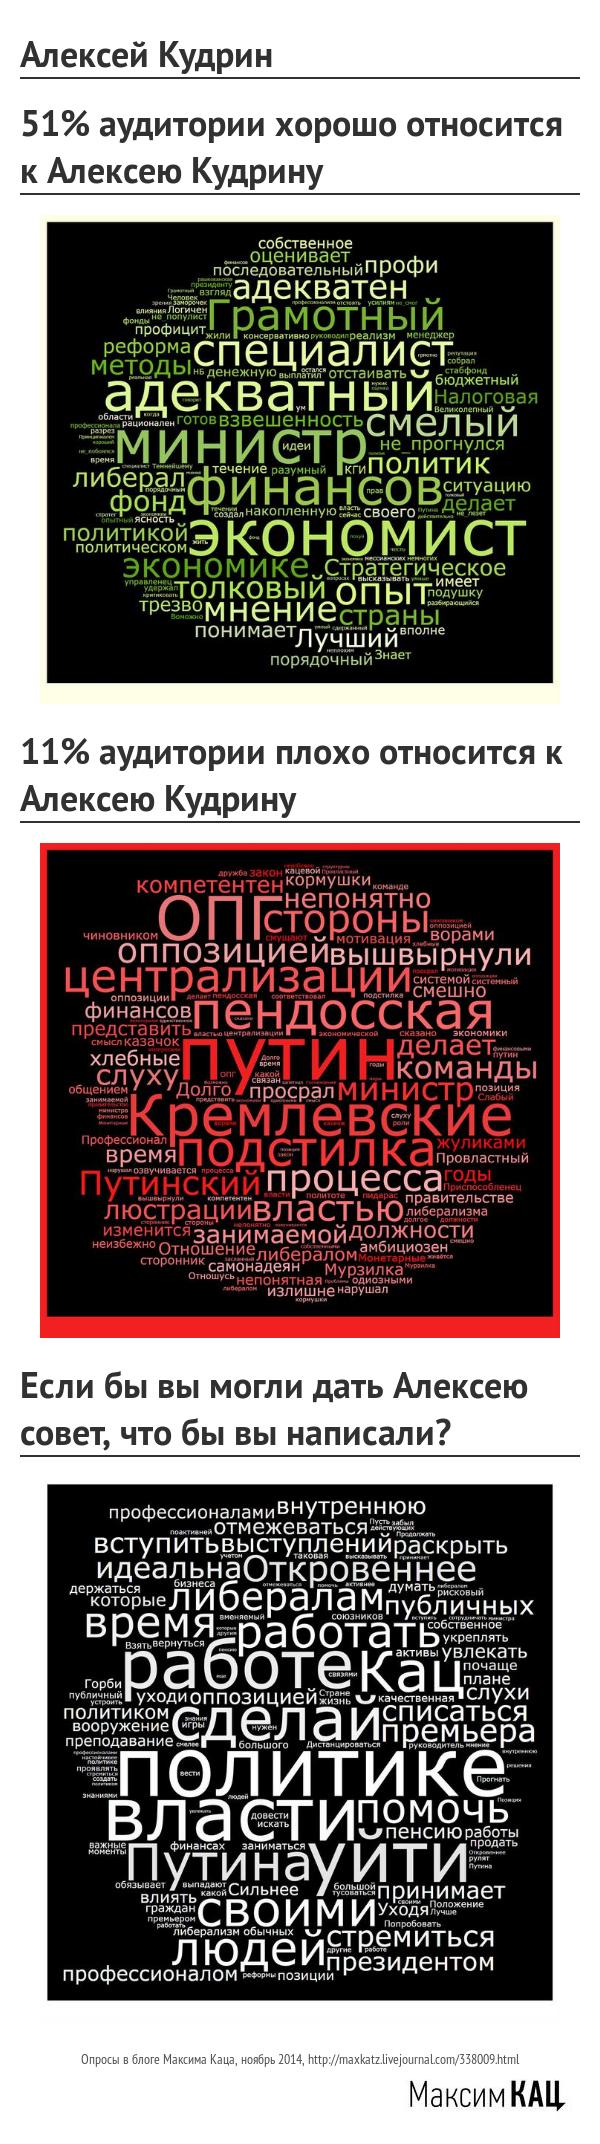 Aleksei_Kudrin